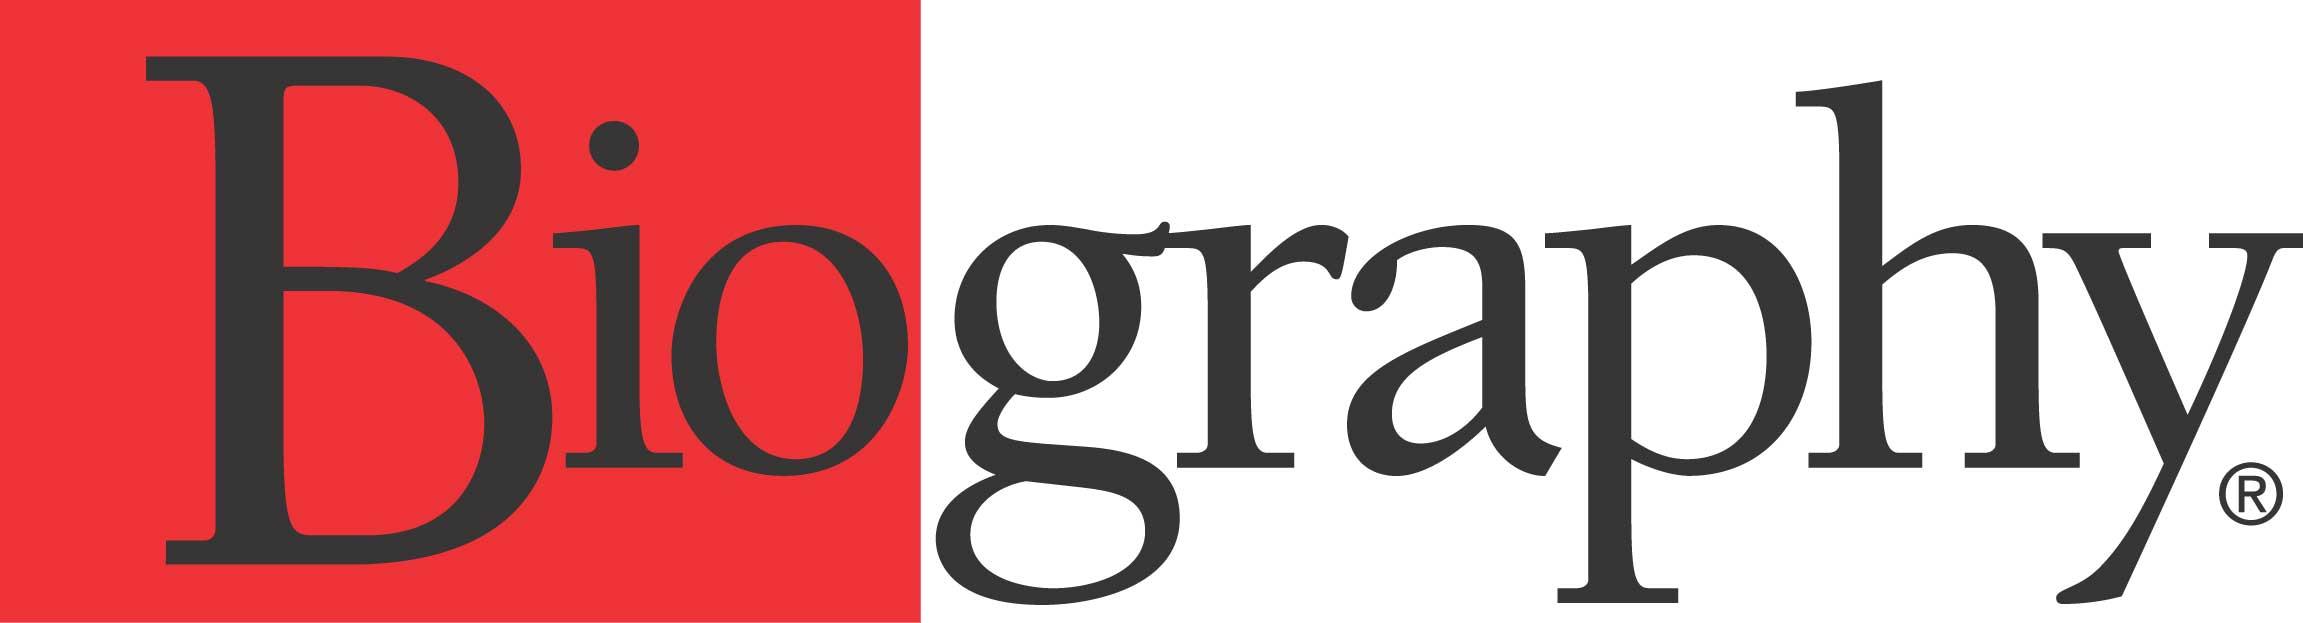 Autobiography logo